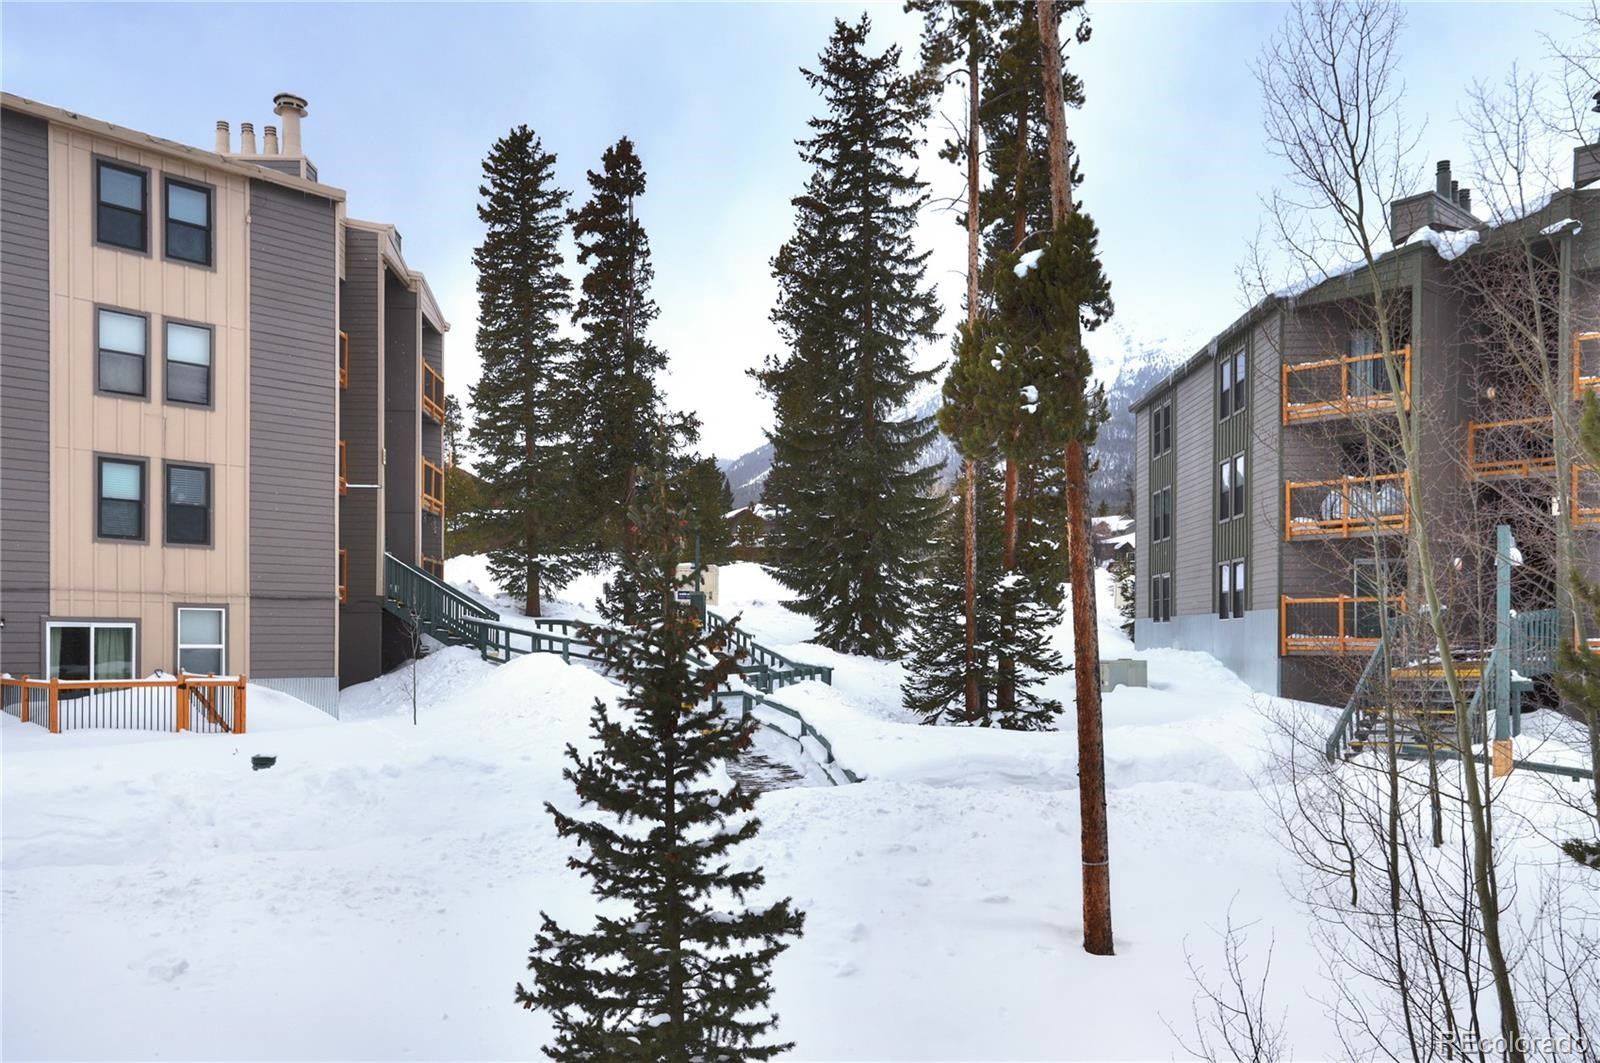 MLS# 3104503 - 22 - 2400 Lodge Pole Circle #206, Silverthorne, CO 80498